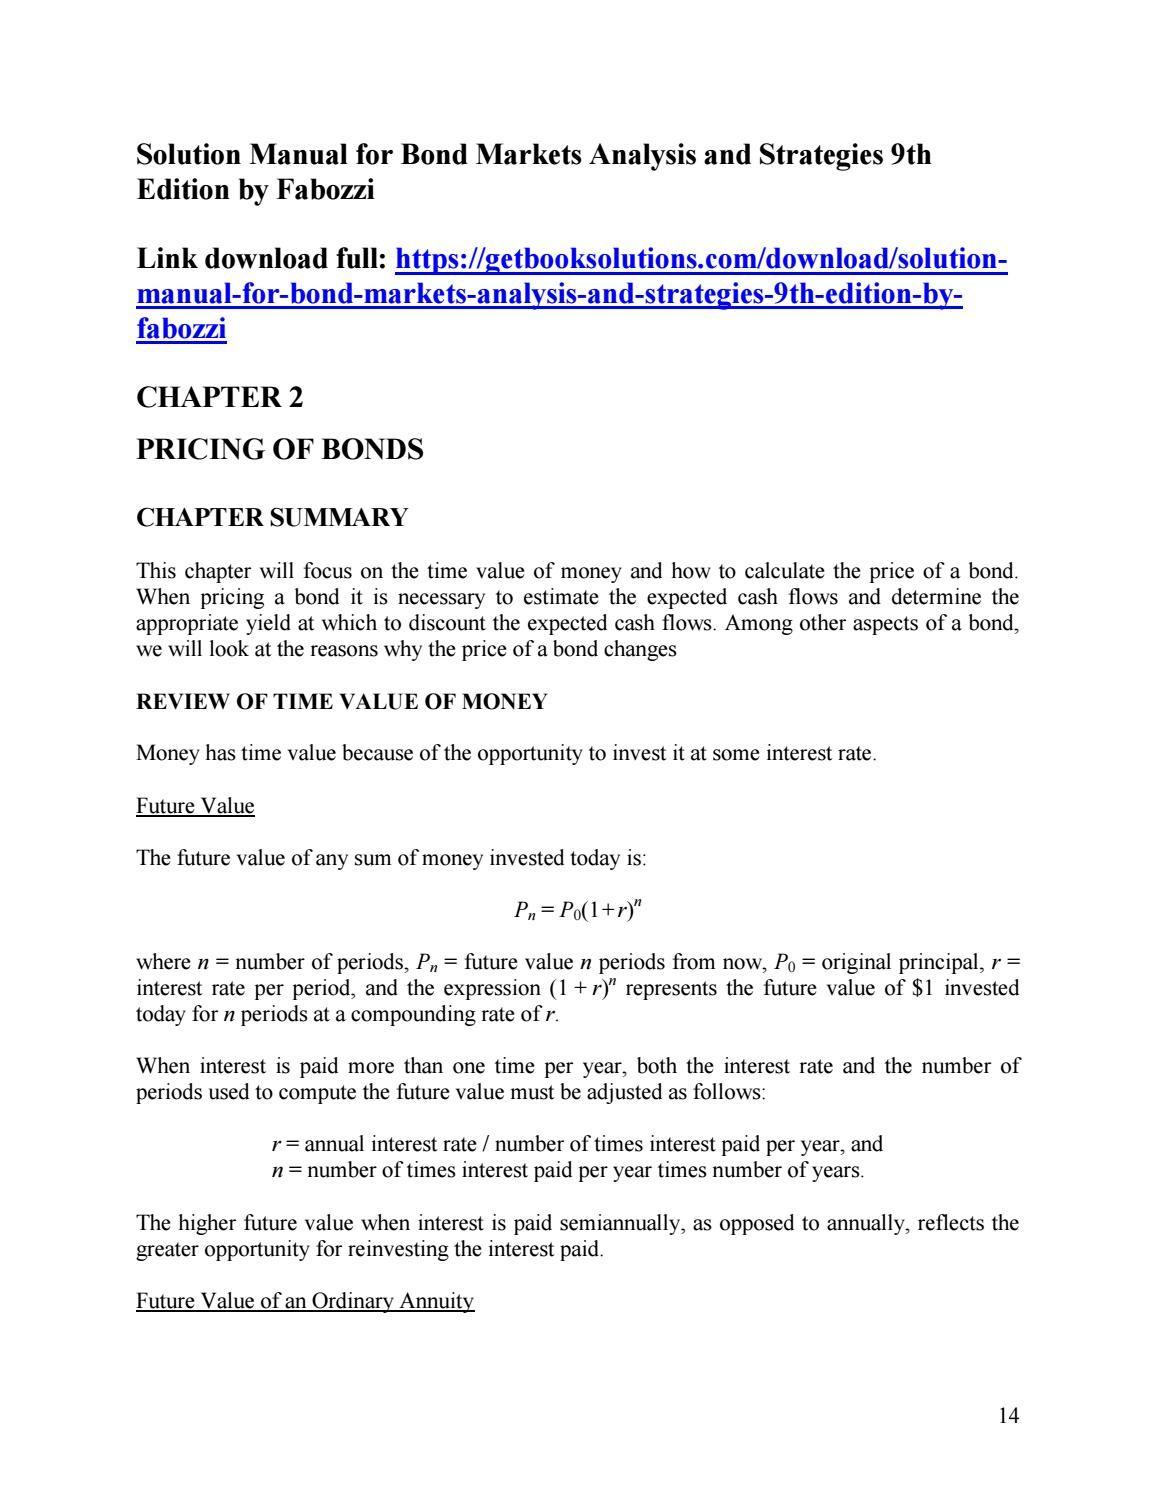 solution manual for bond markets analysis and strategies 9th edition rh pinterest co uk By Frank J. Fabozzi Bond Portfolio Management Frank J. Fabozzi